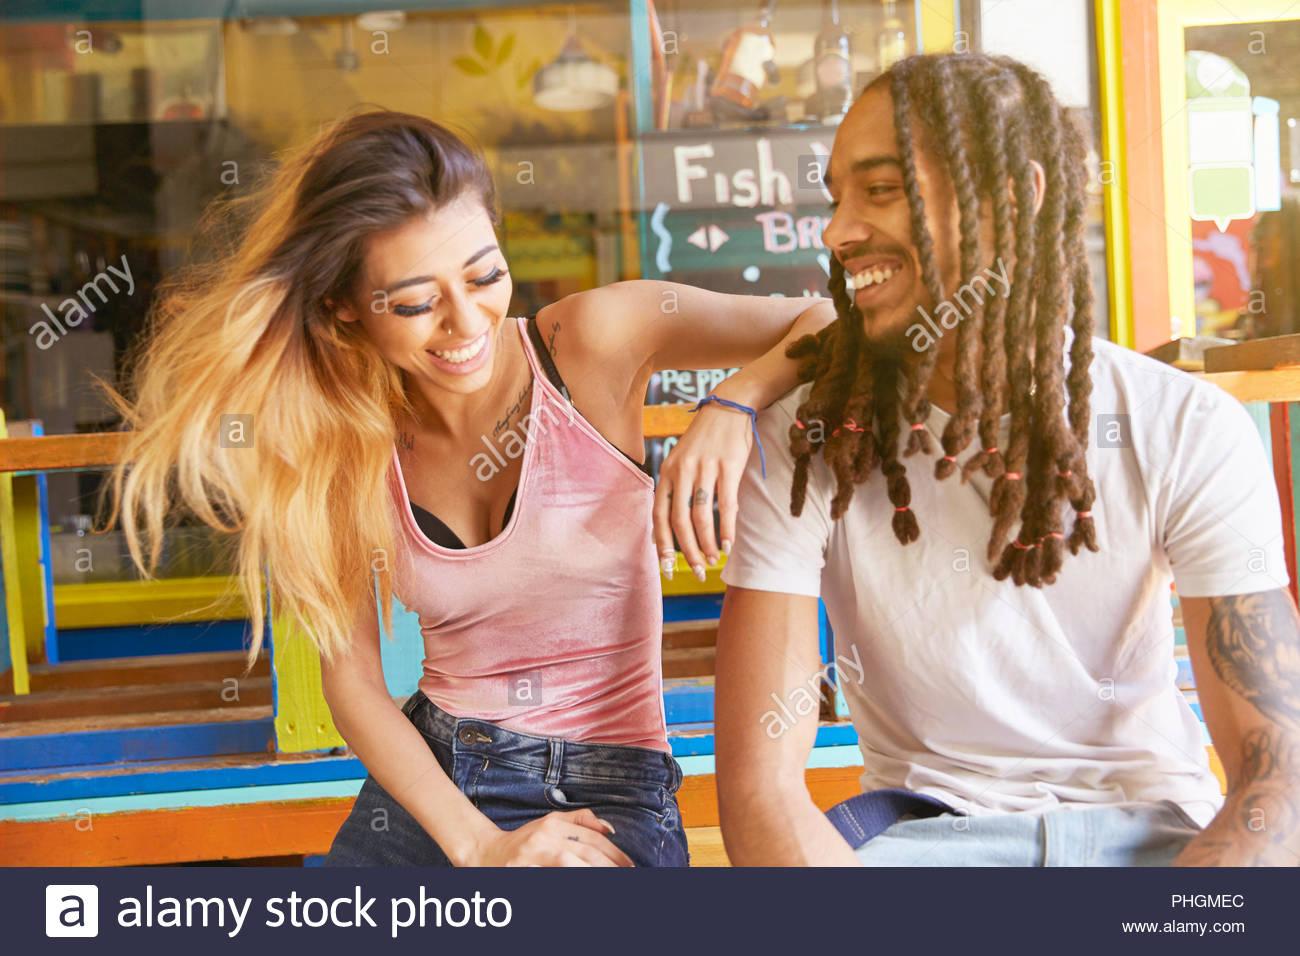 Couple sitting together - Stock Image